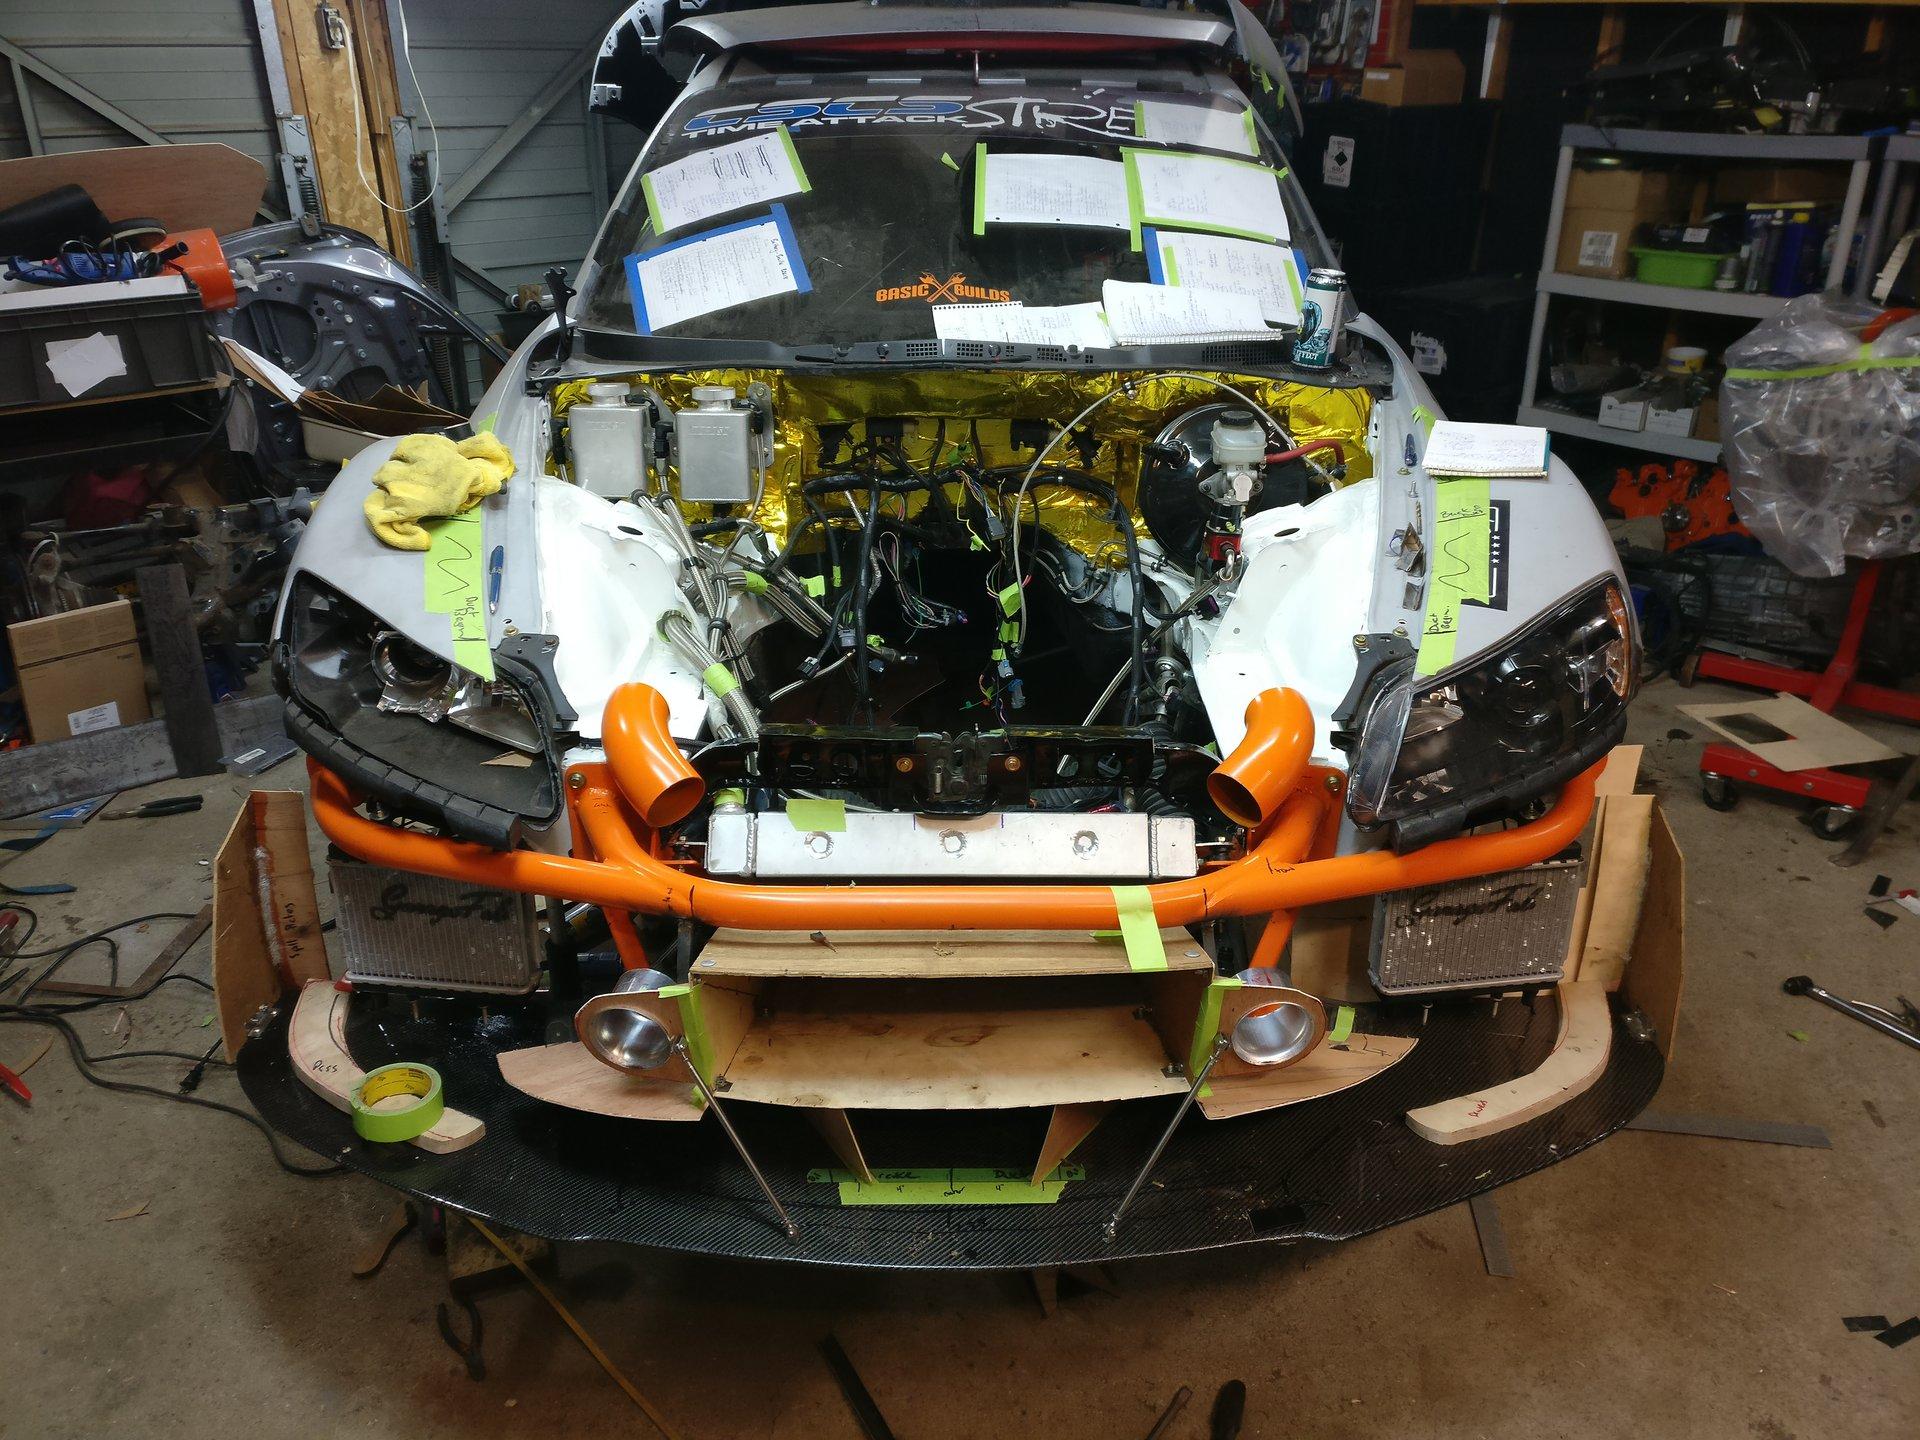 ATS-V LF4 into an RX8 - Build thread   Page 3   Cadillac